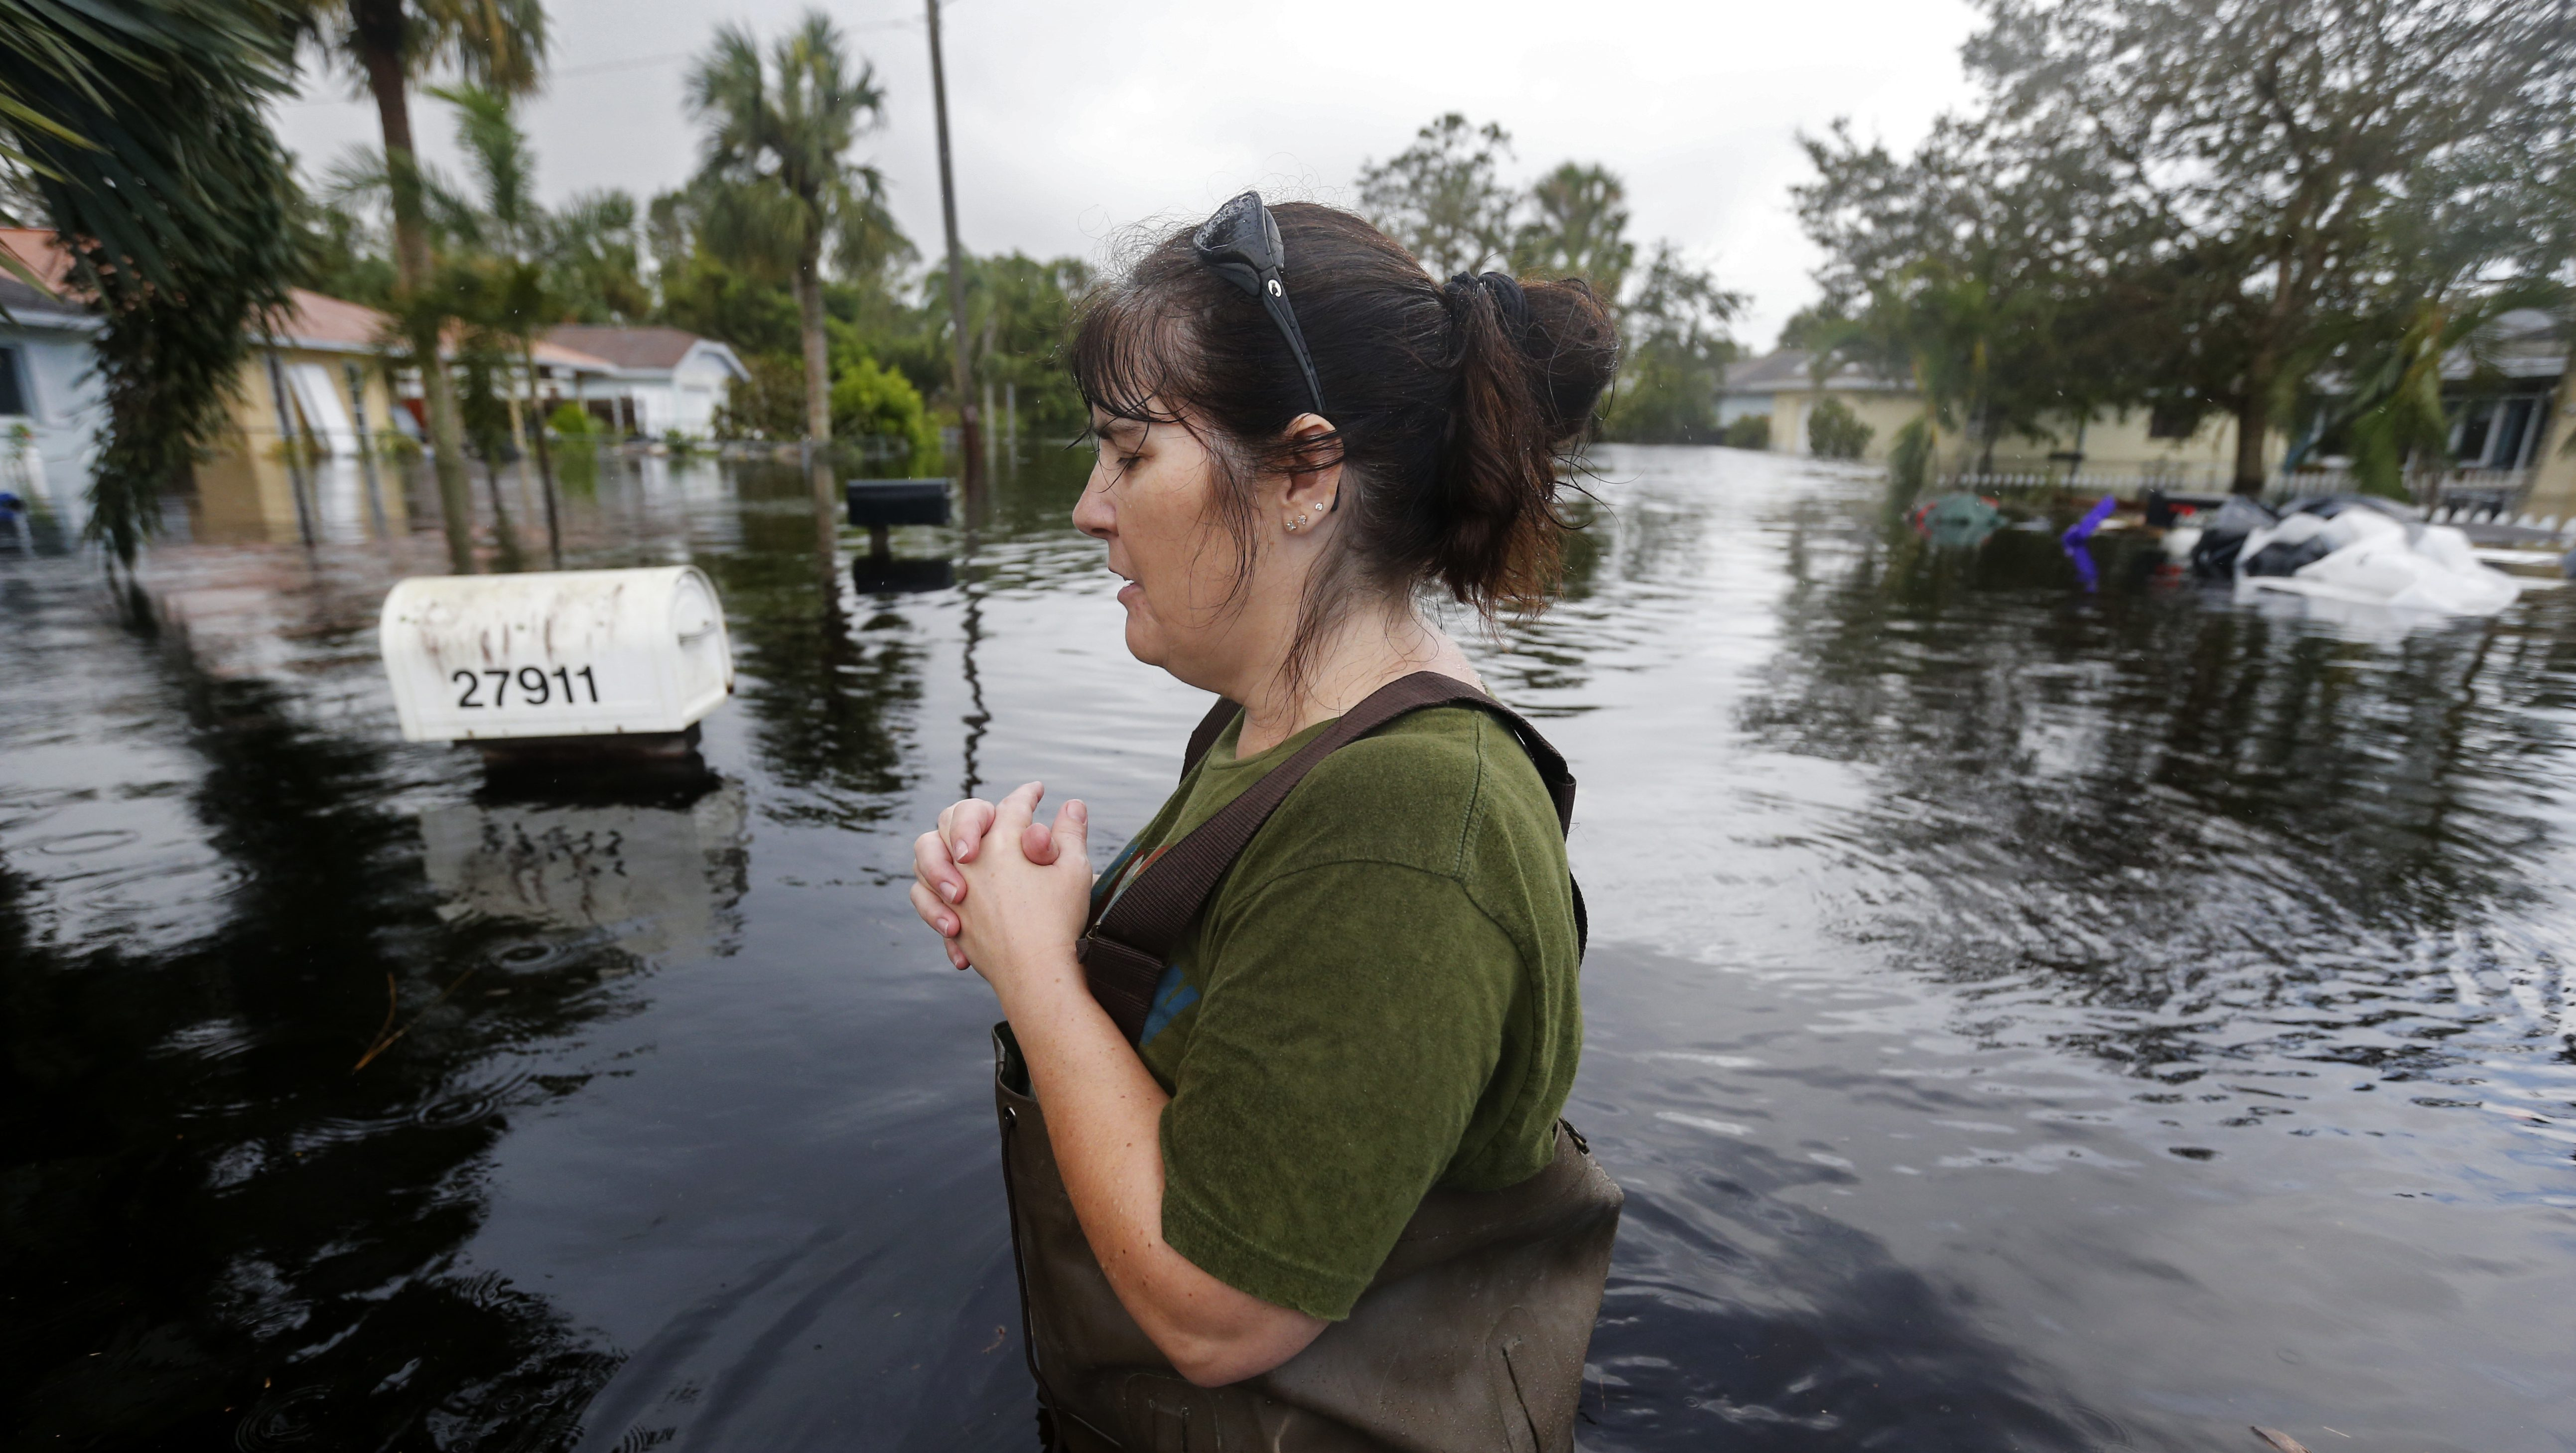 florida got flooded by irma